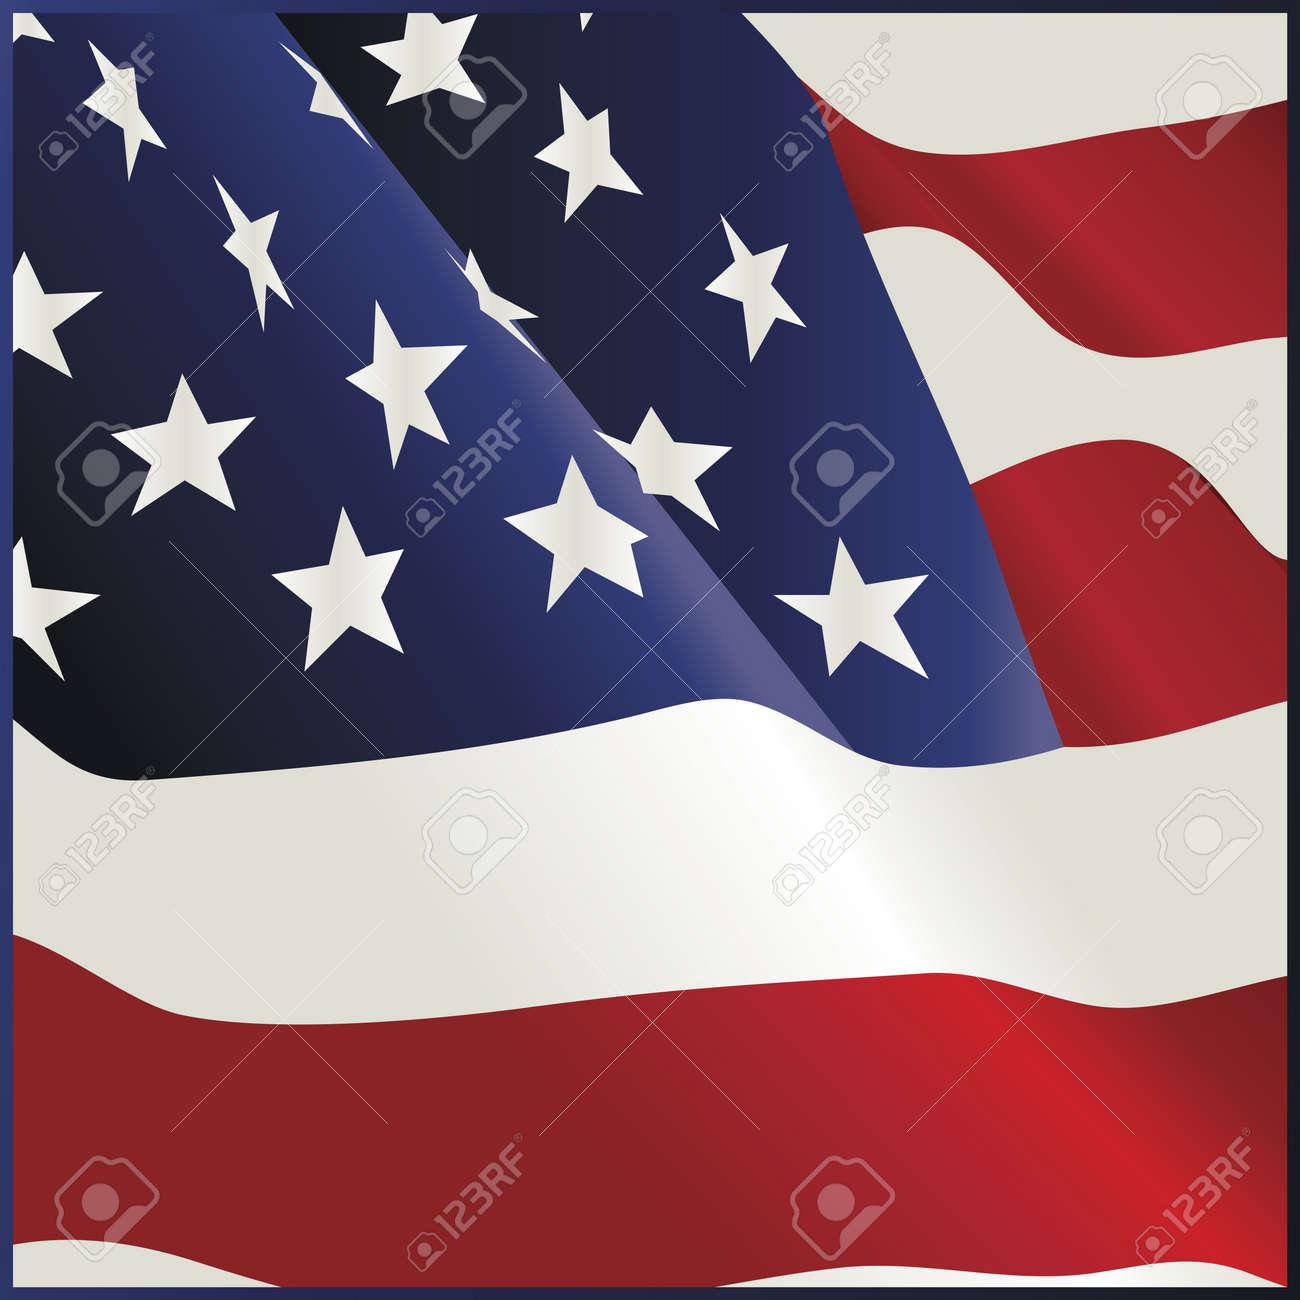 Waving American Flag Bandana Design Stock Vector - 10050127